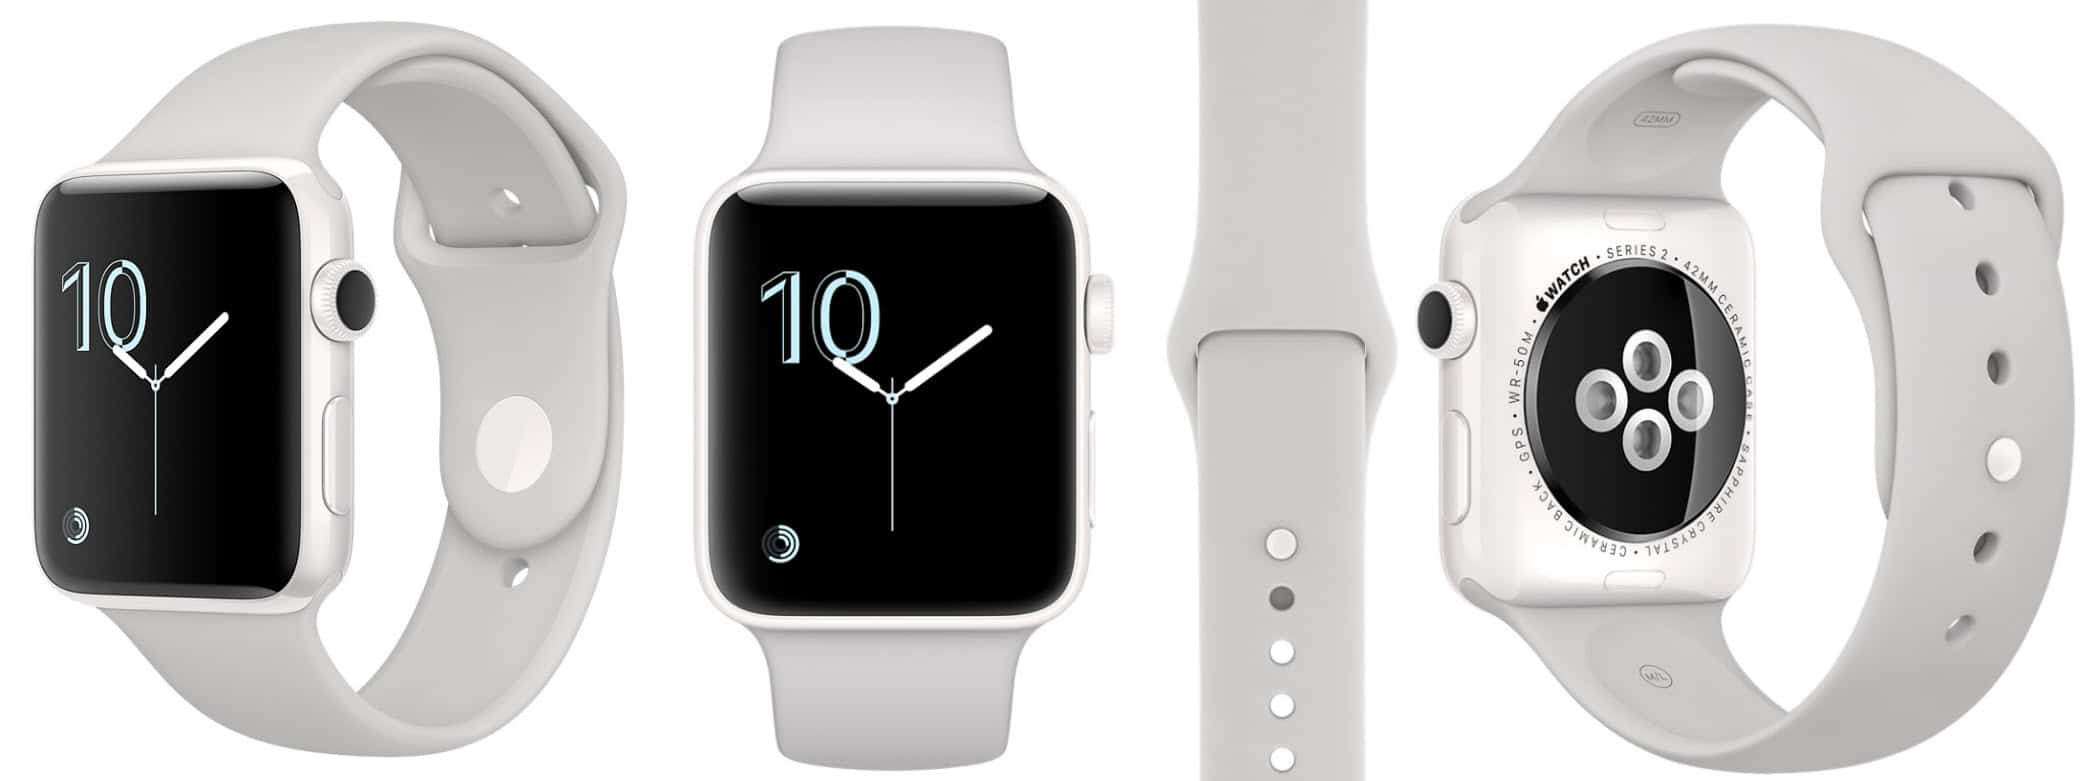 apple-watch-series-2-edition